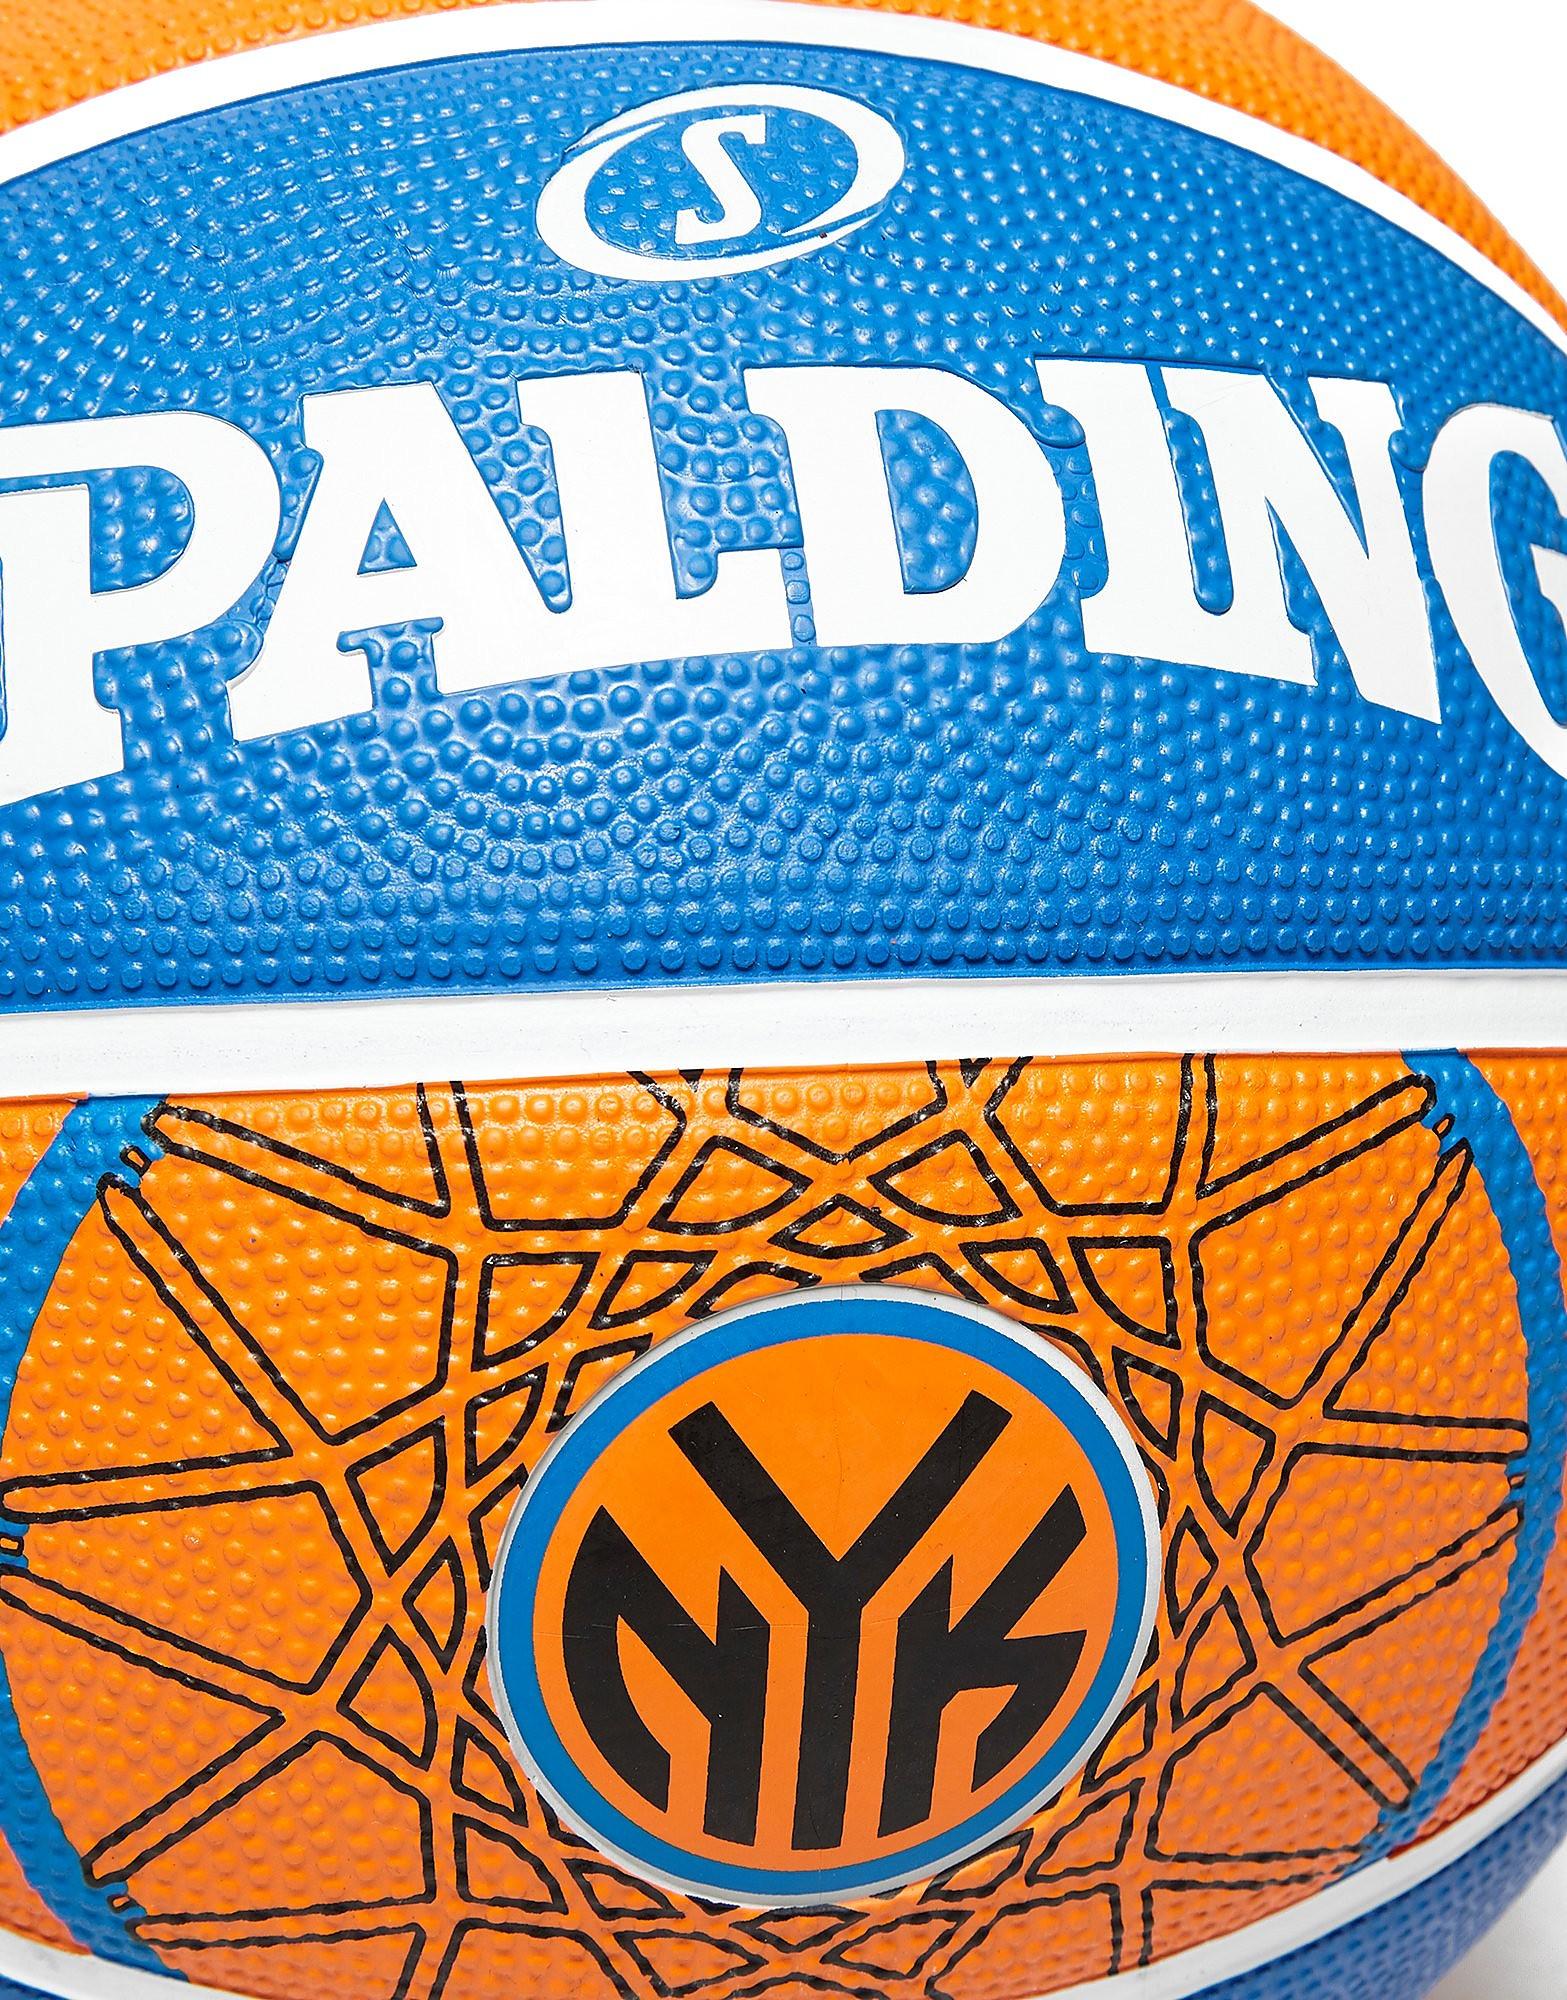 Spalding NBA NY Team Basketball